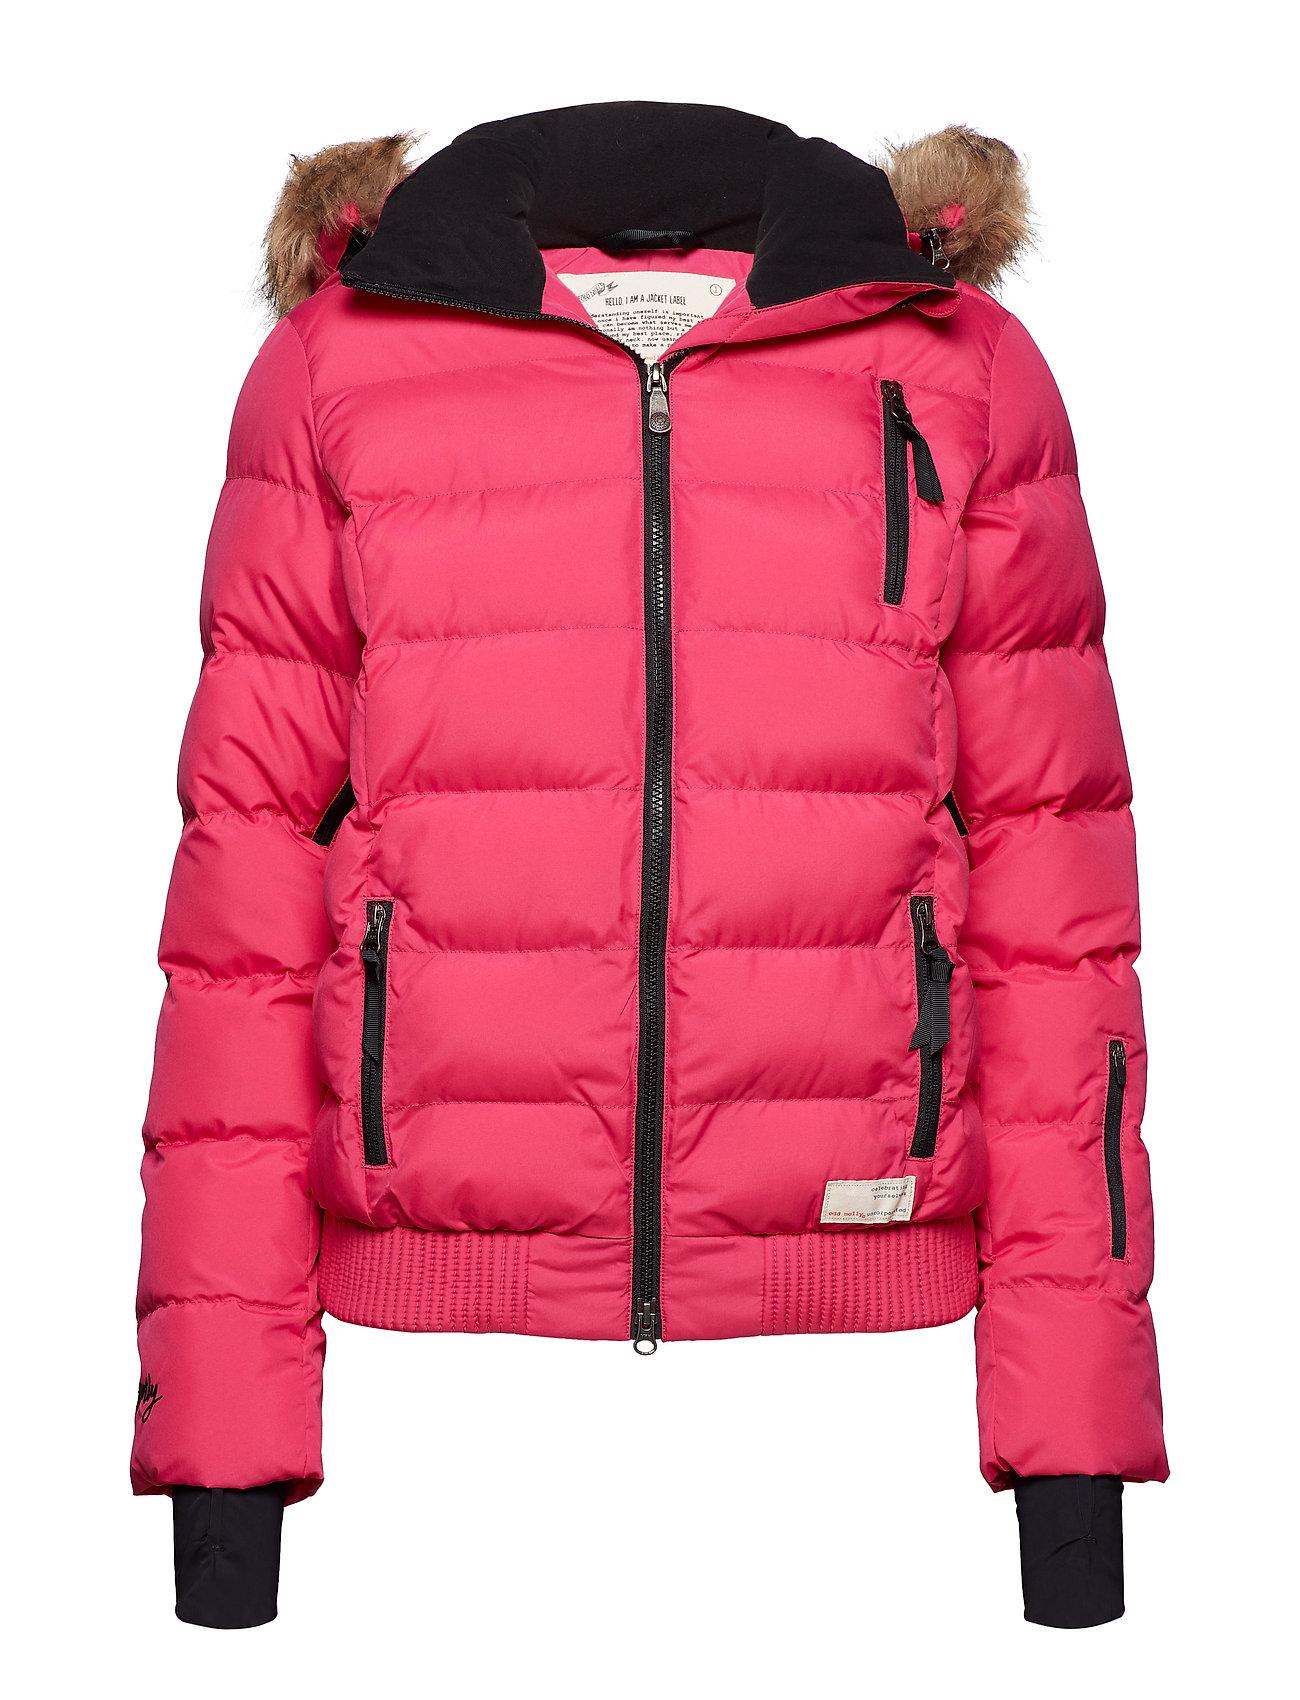 ODD MOLLY ACTIVE WEAR glorious jacket